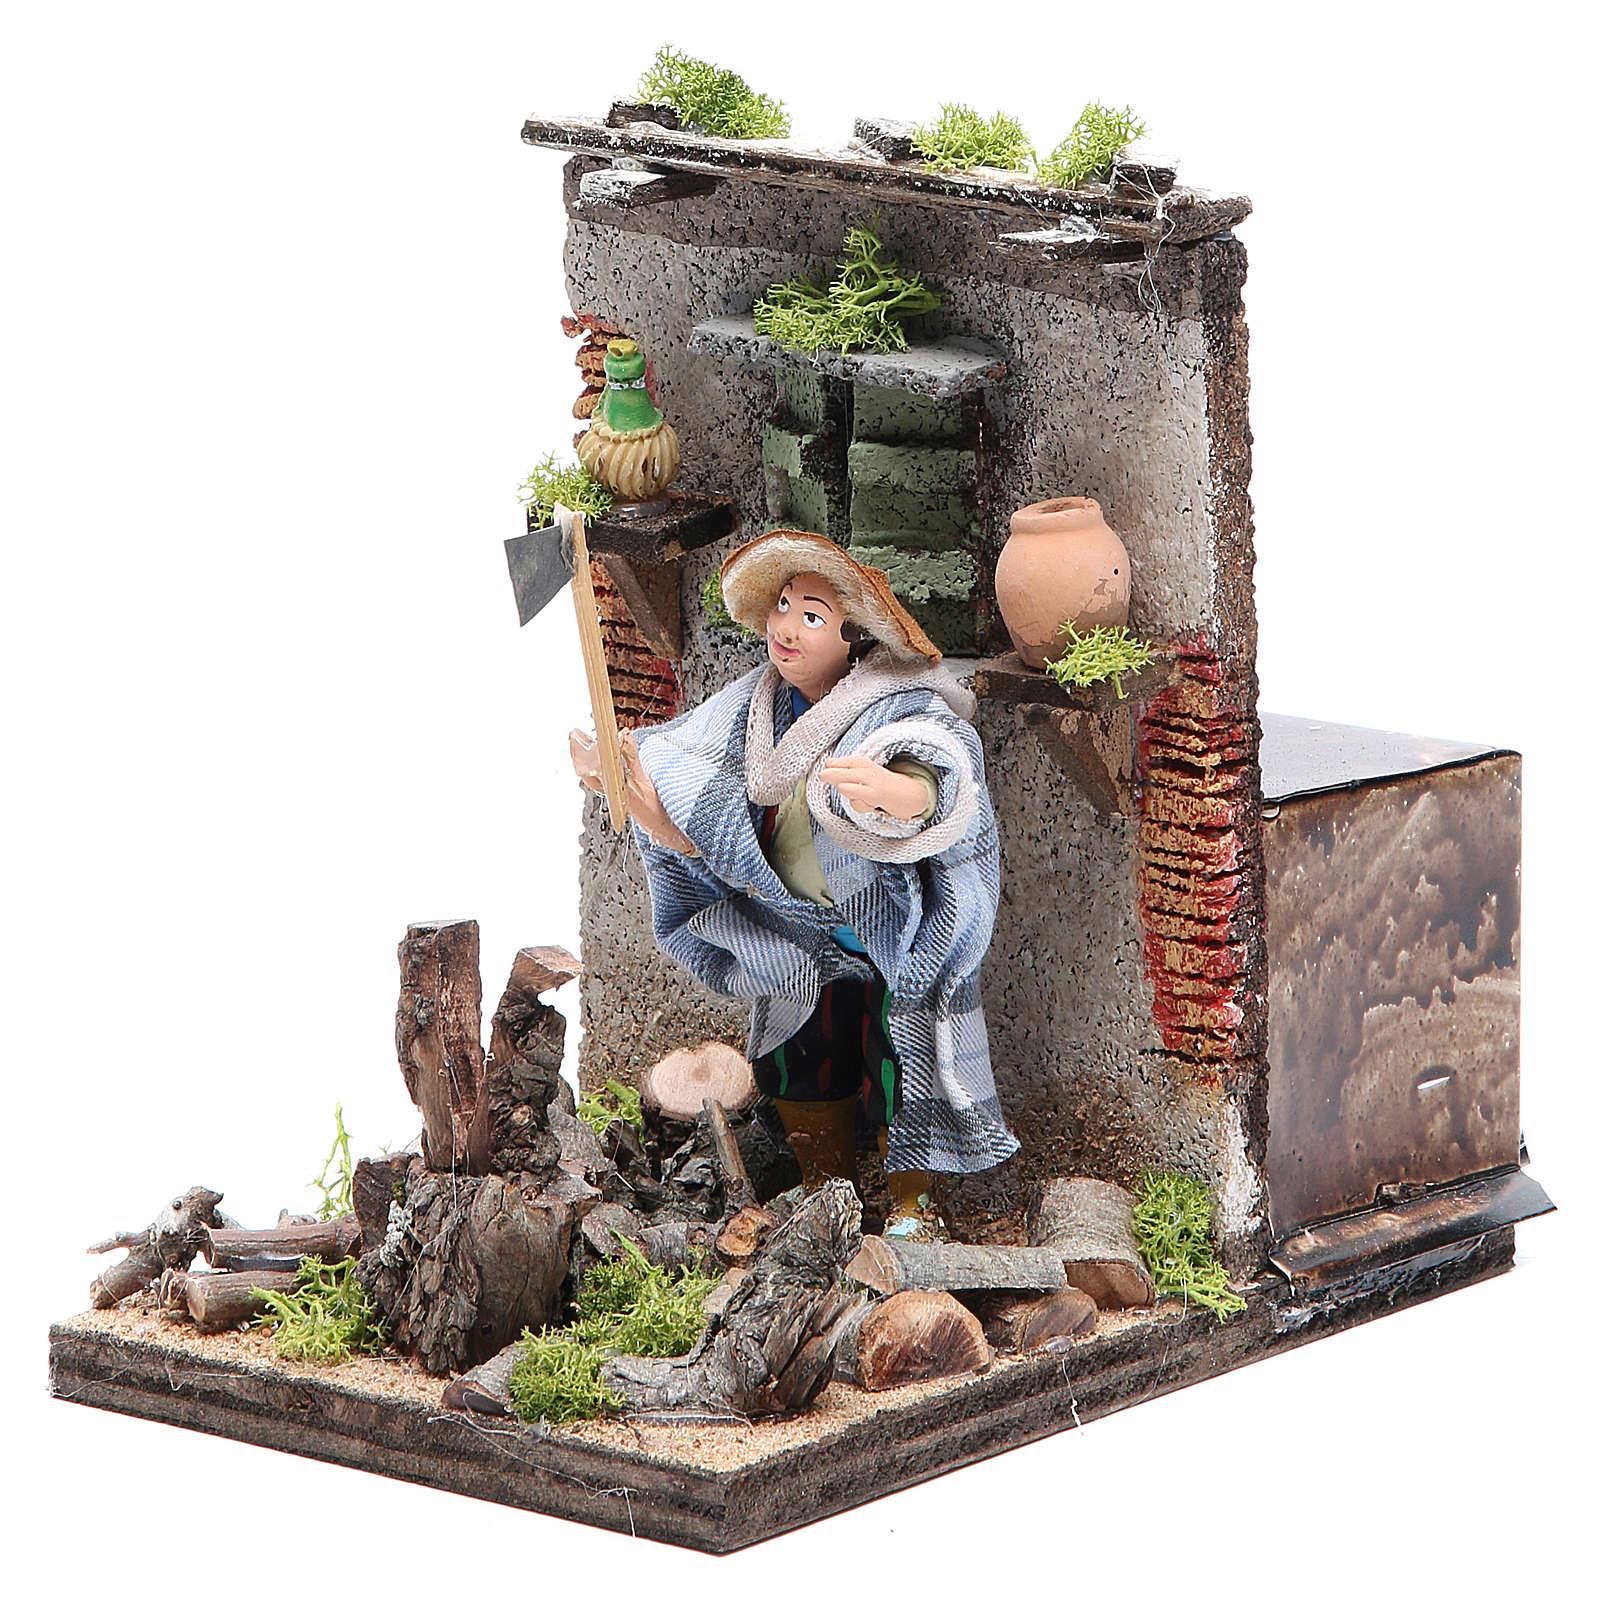 Woodcutter measuring 10cm, animated nativity figurine 4